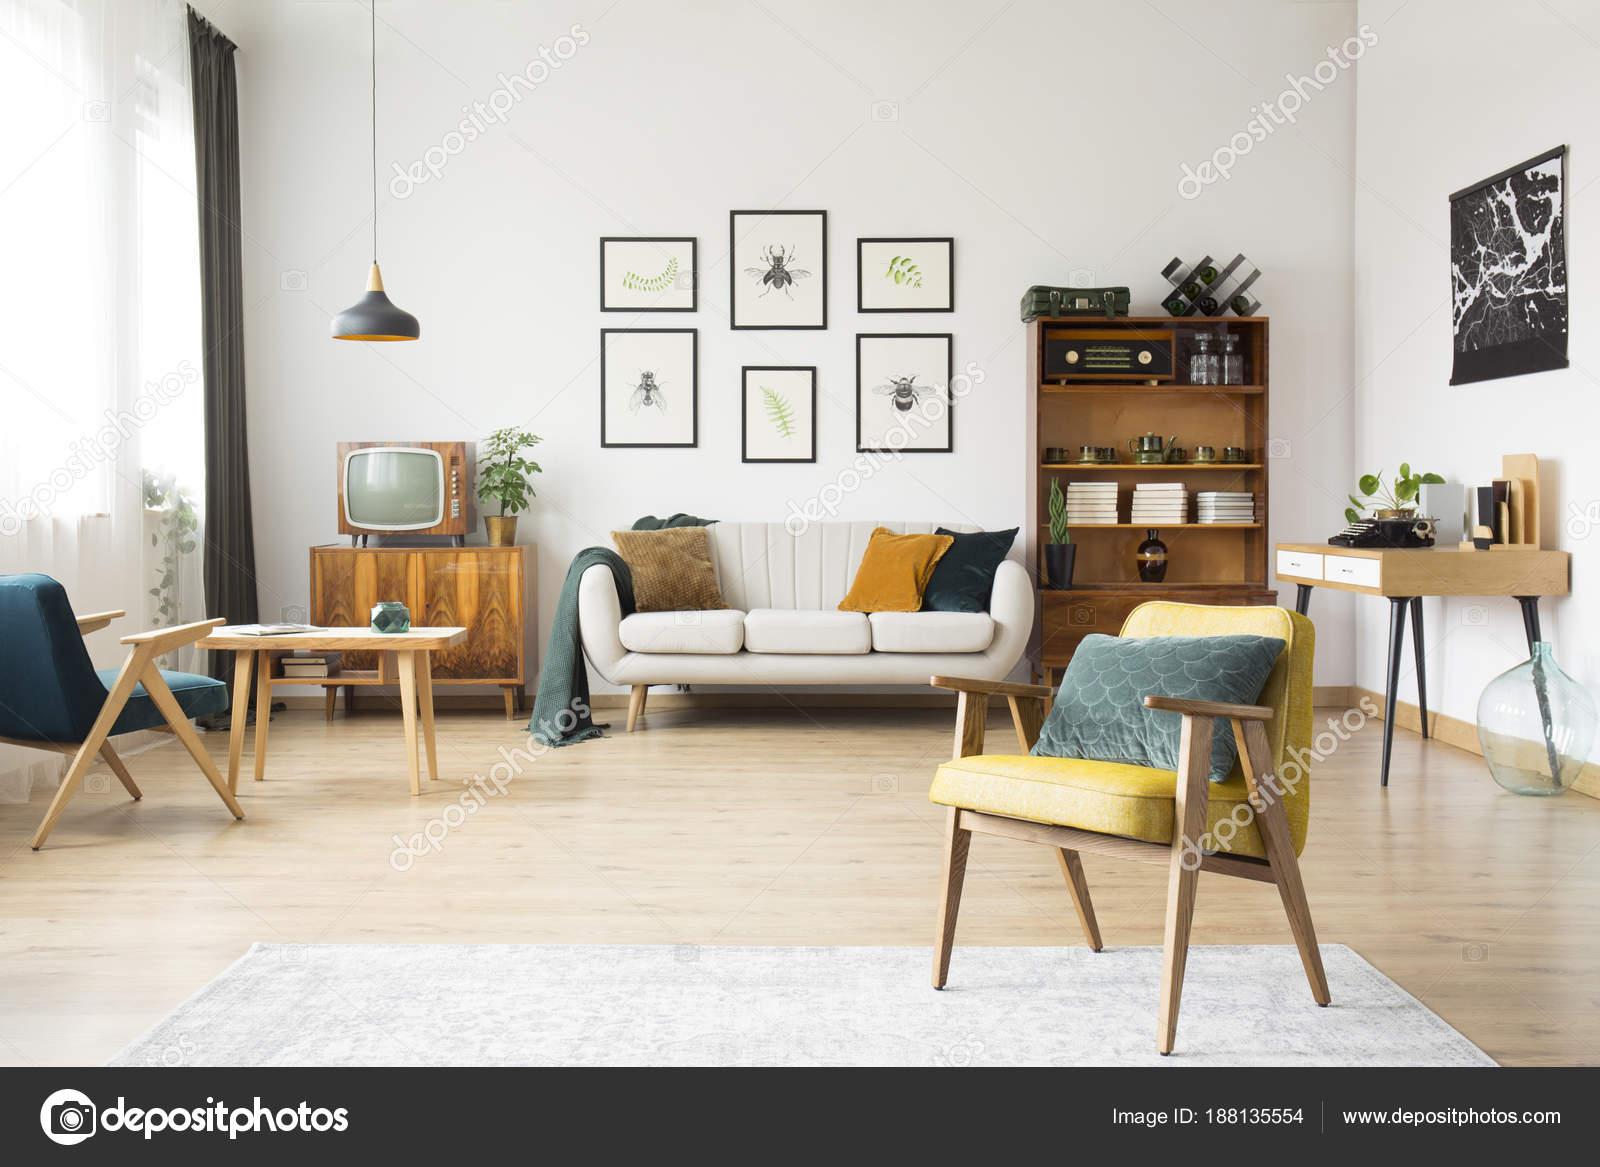 Retro woonkamer interieur  Stockfoto  photographeeeu